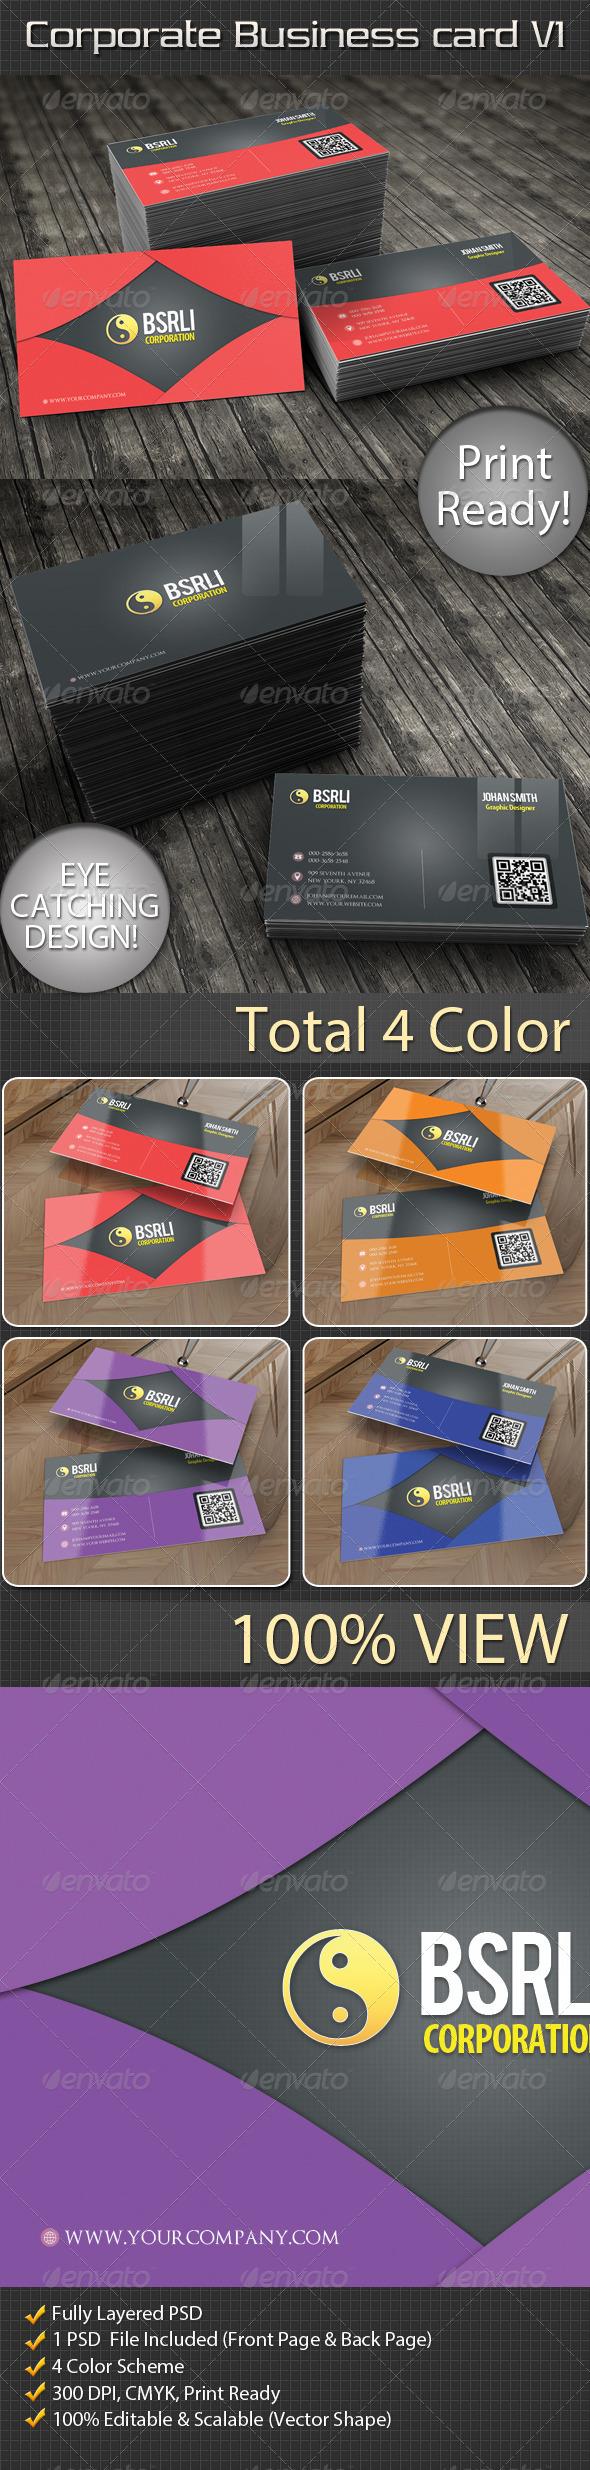 Corporate Business Card V1 - Corporate Business Cards